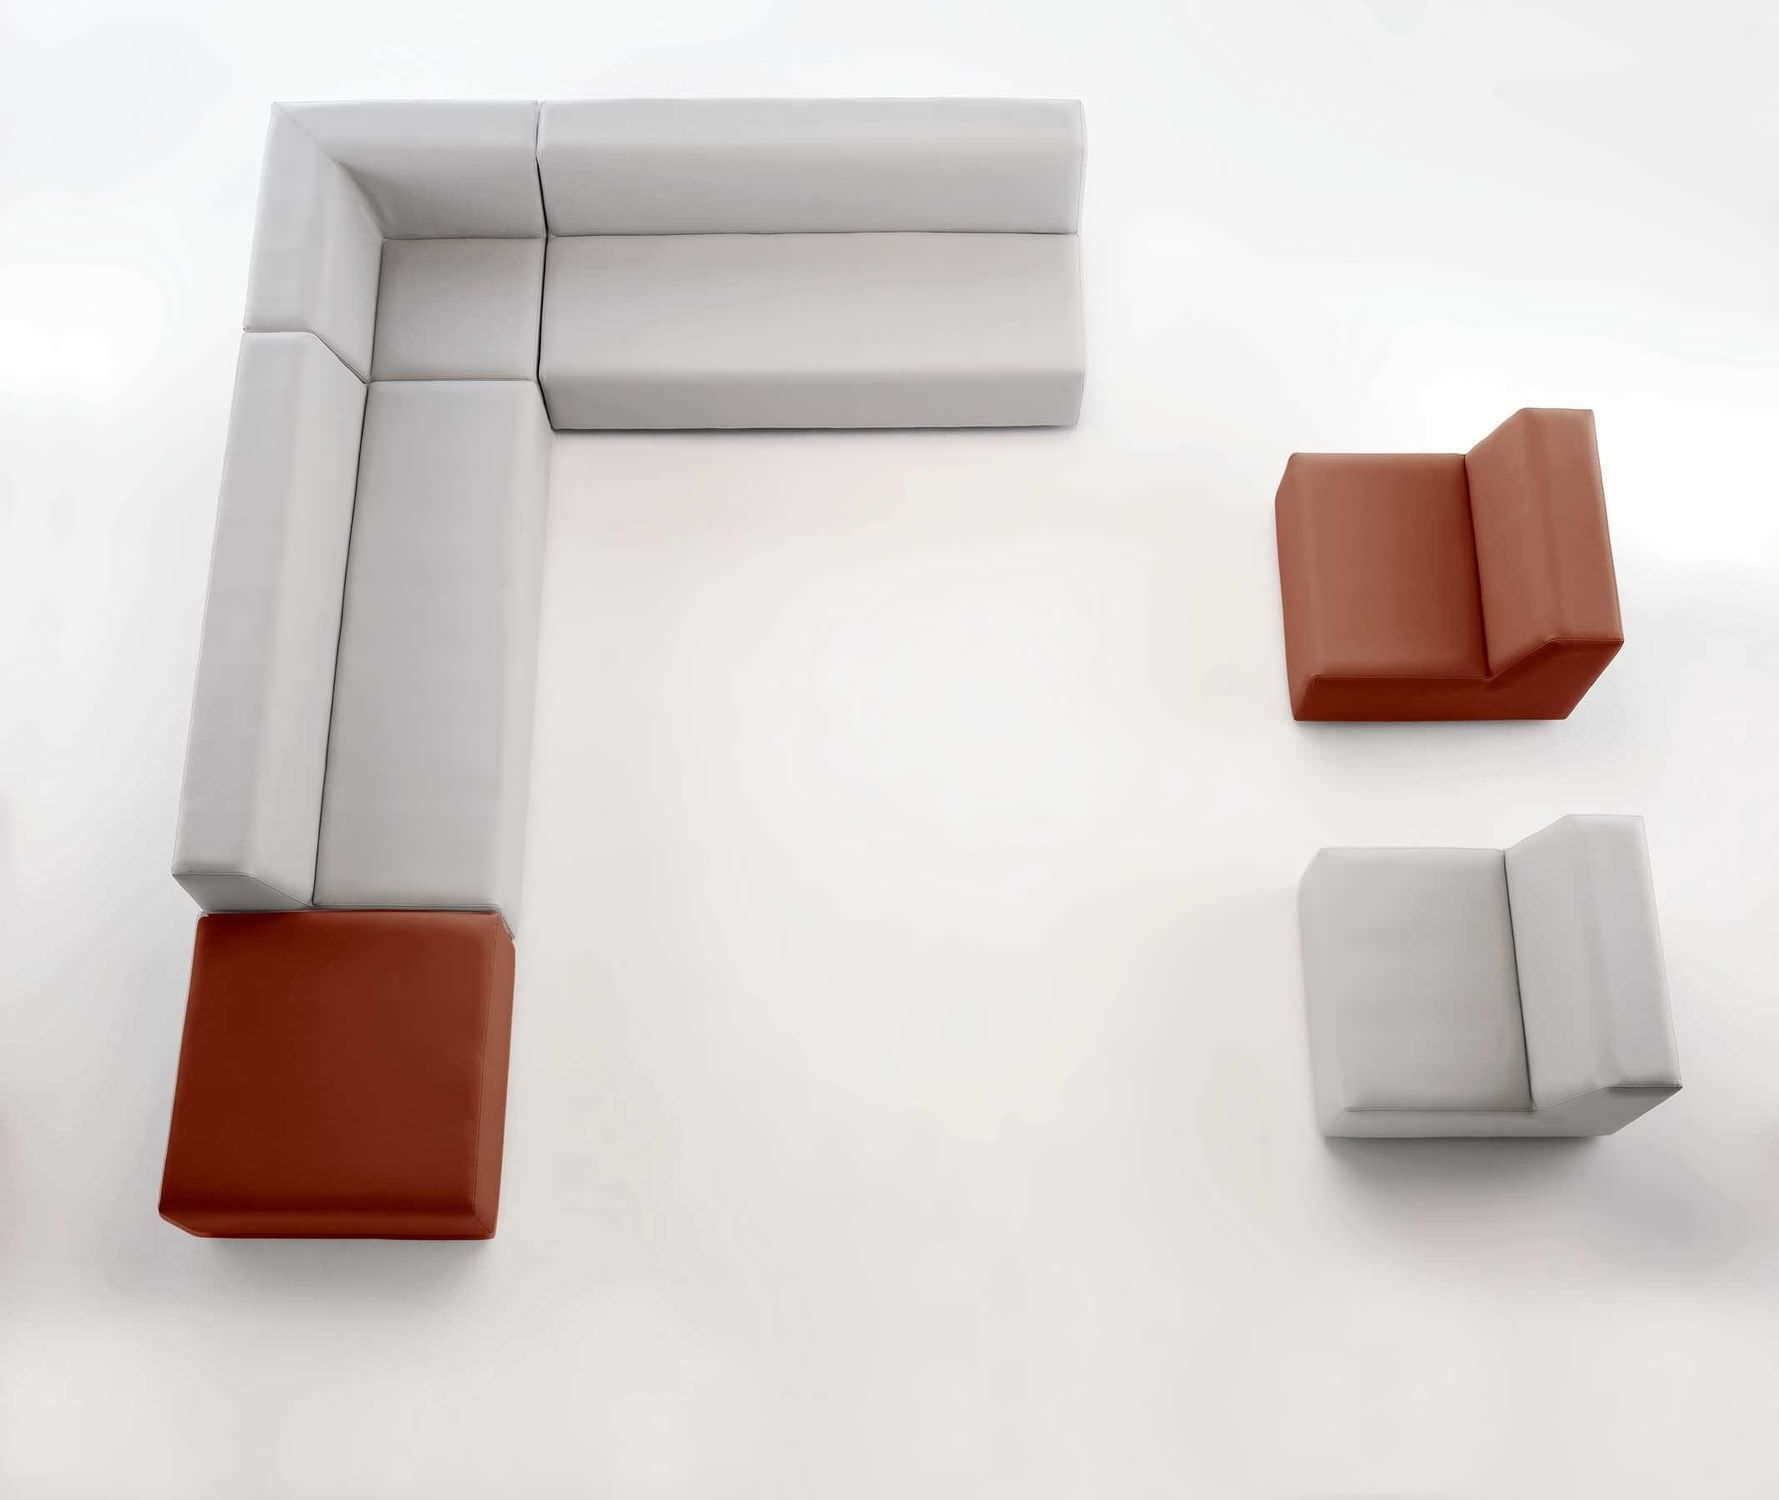 High Resolution Image Sofa Design Modular Sofa 1779x1500